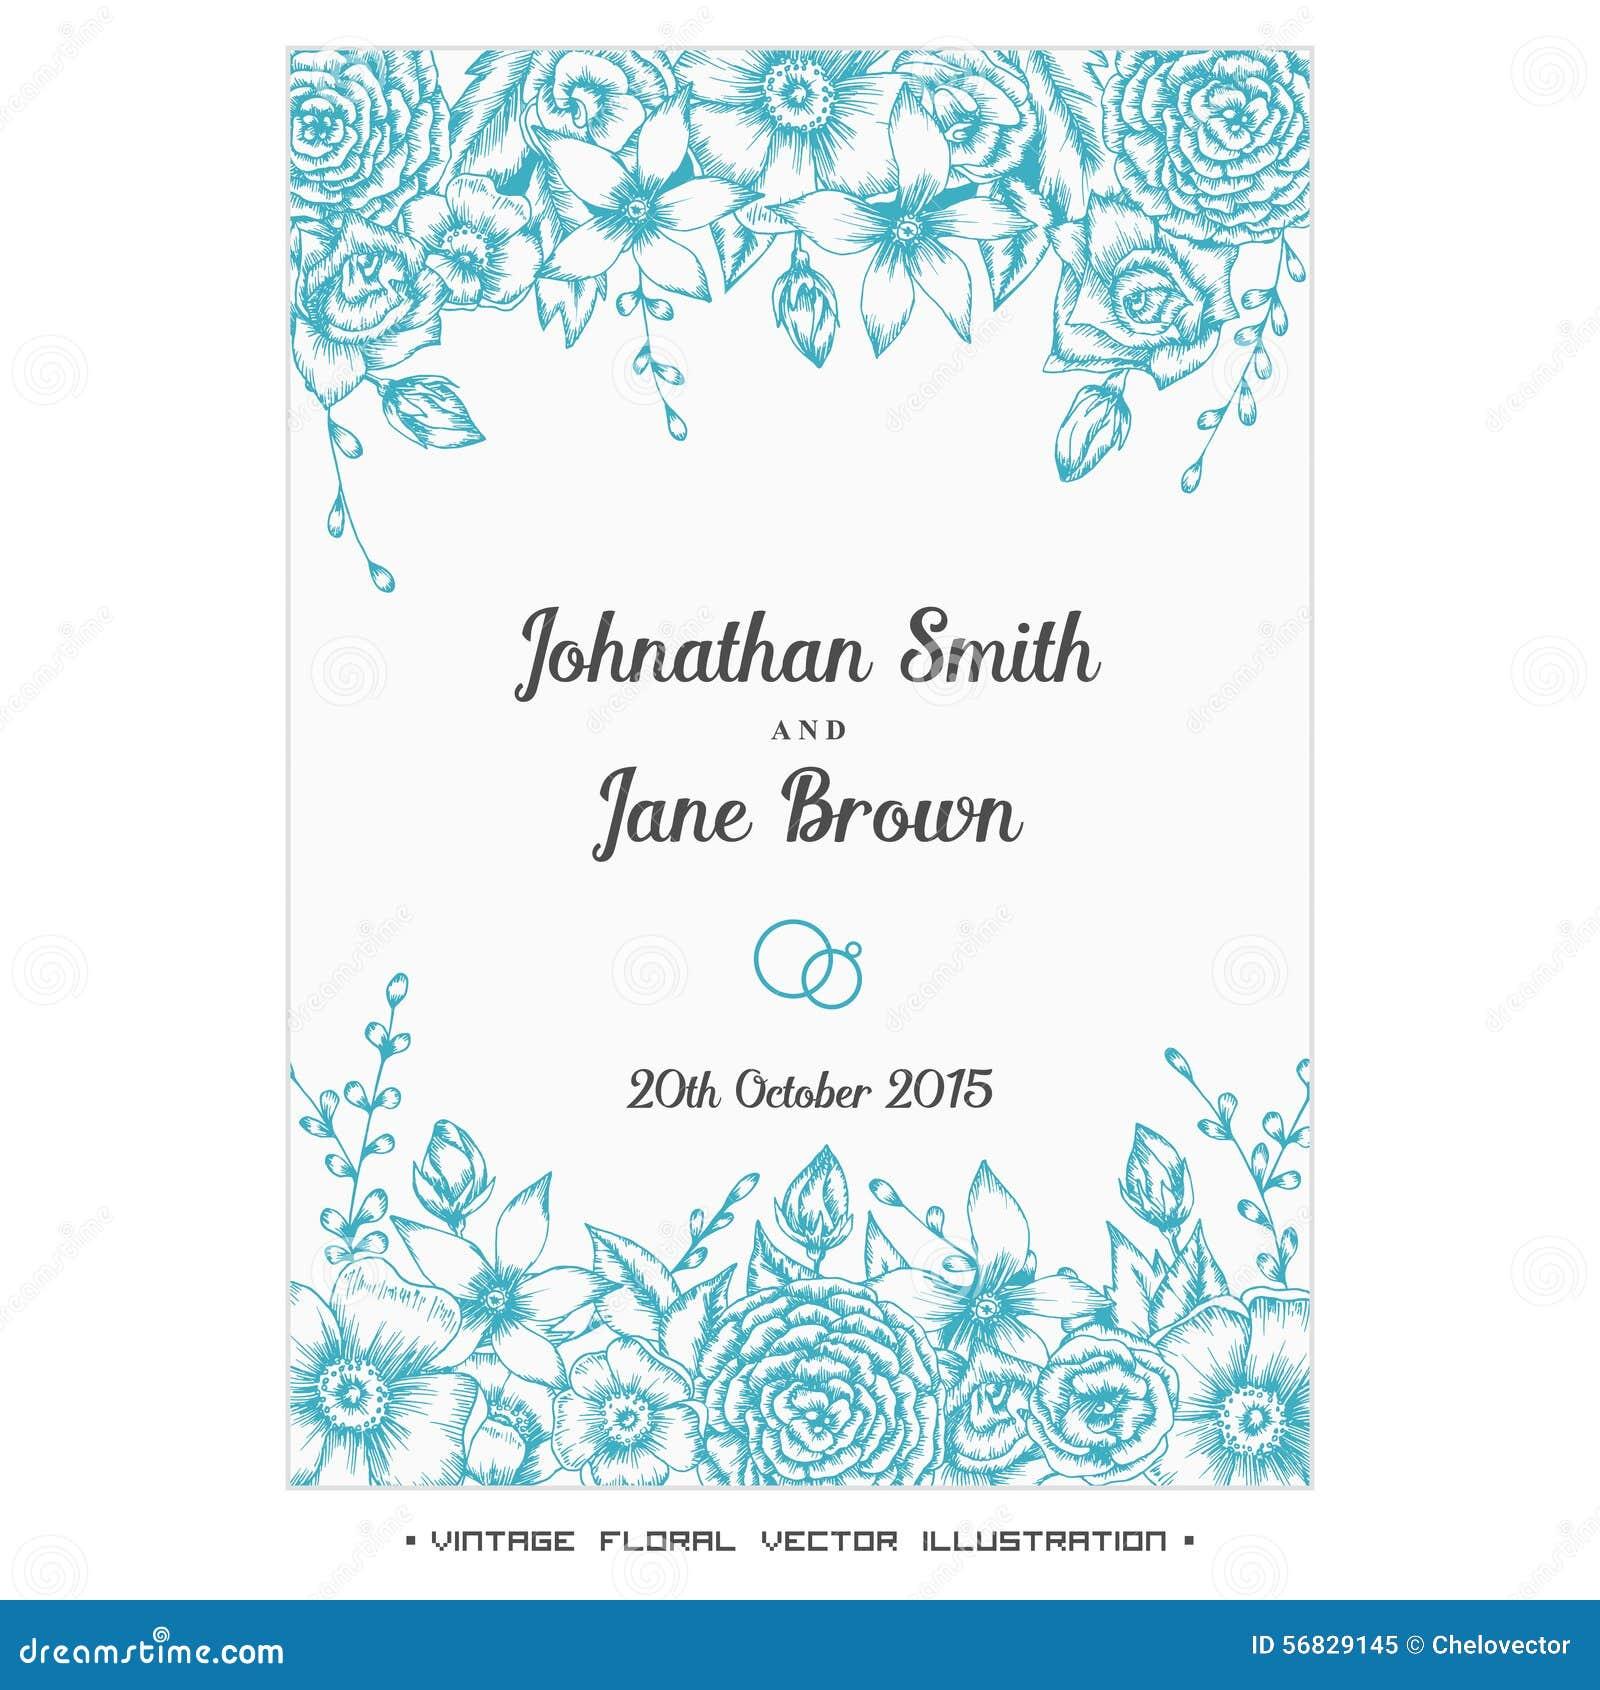 Flower Svg Library Download For Wedding Invitations: Vector Vintage Floral Wedding Invitation Stock Vector